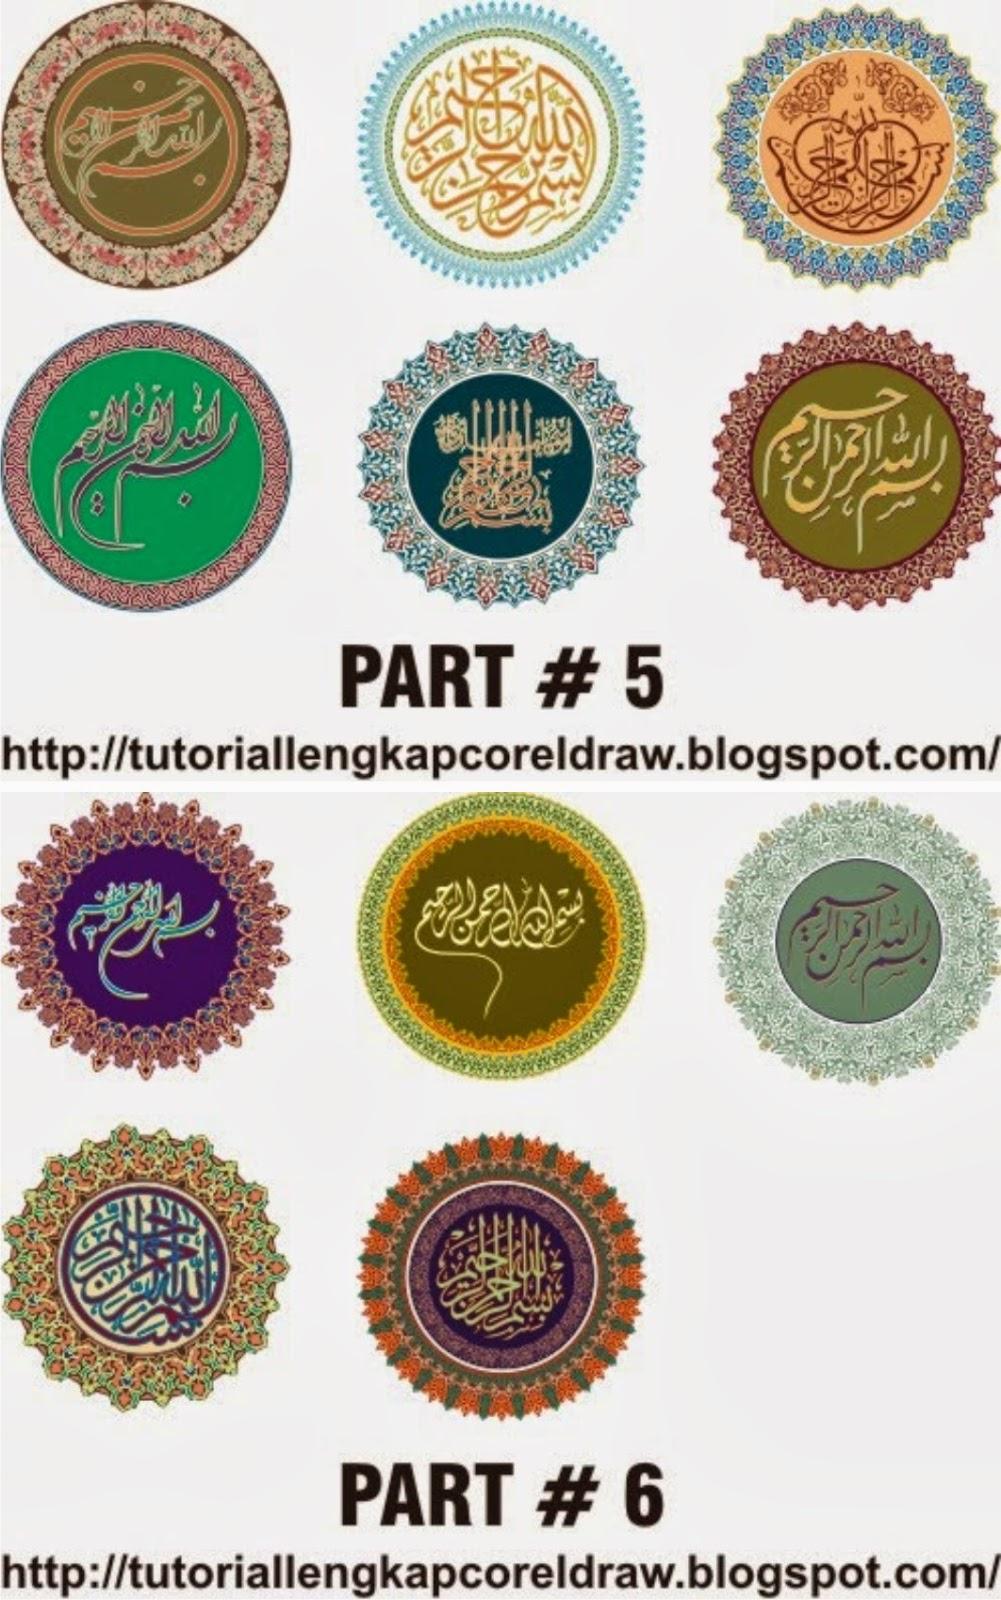 basmallah vector CDR, www.tutoriallengkapcoreldraw.blogspot.com